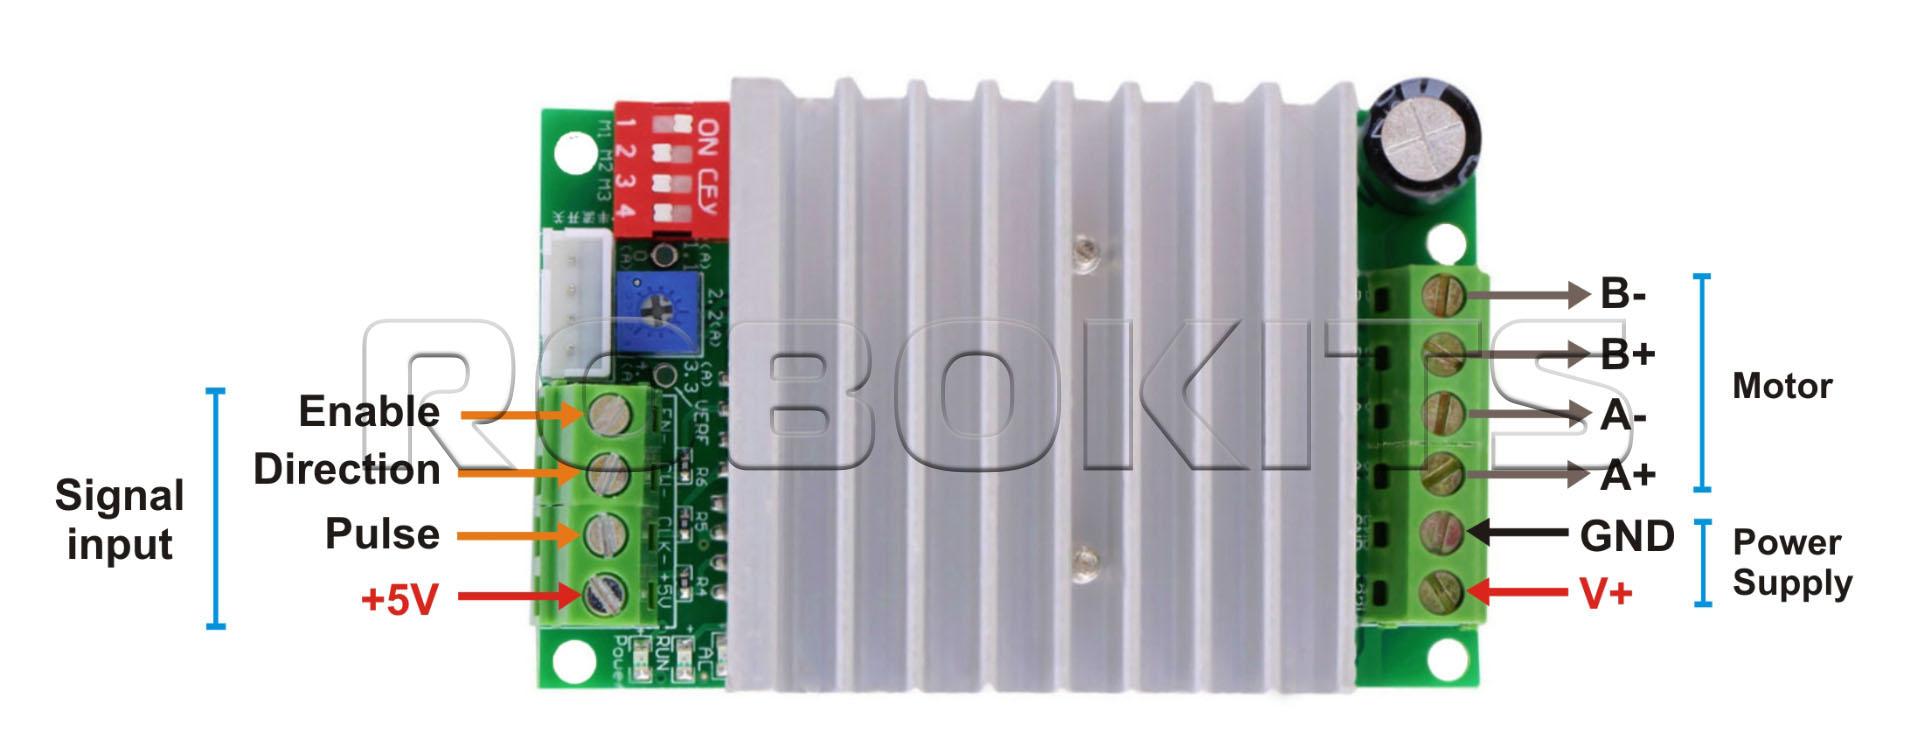 Tb6600 Stepper Driver 45a Rki 1108 575 Robokits India Easy Motor Circuit Drive Downloads Media Model